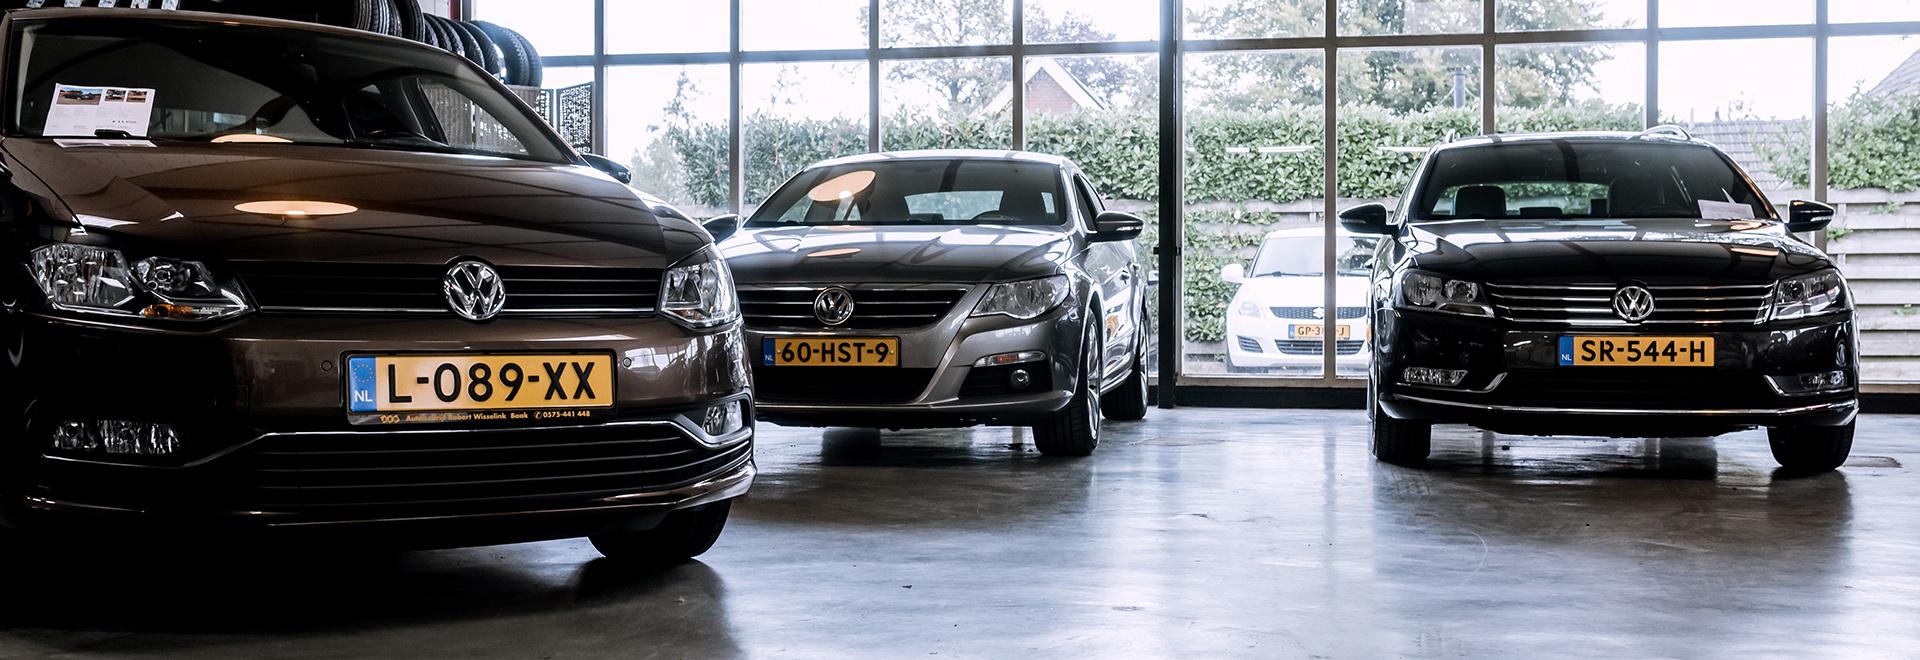 FInanciering & Lease Autobedrijf Robert Wisselink in Baak